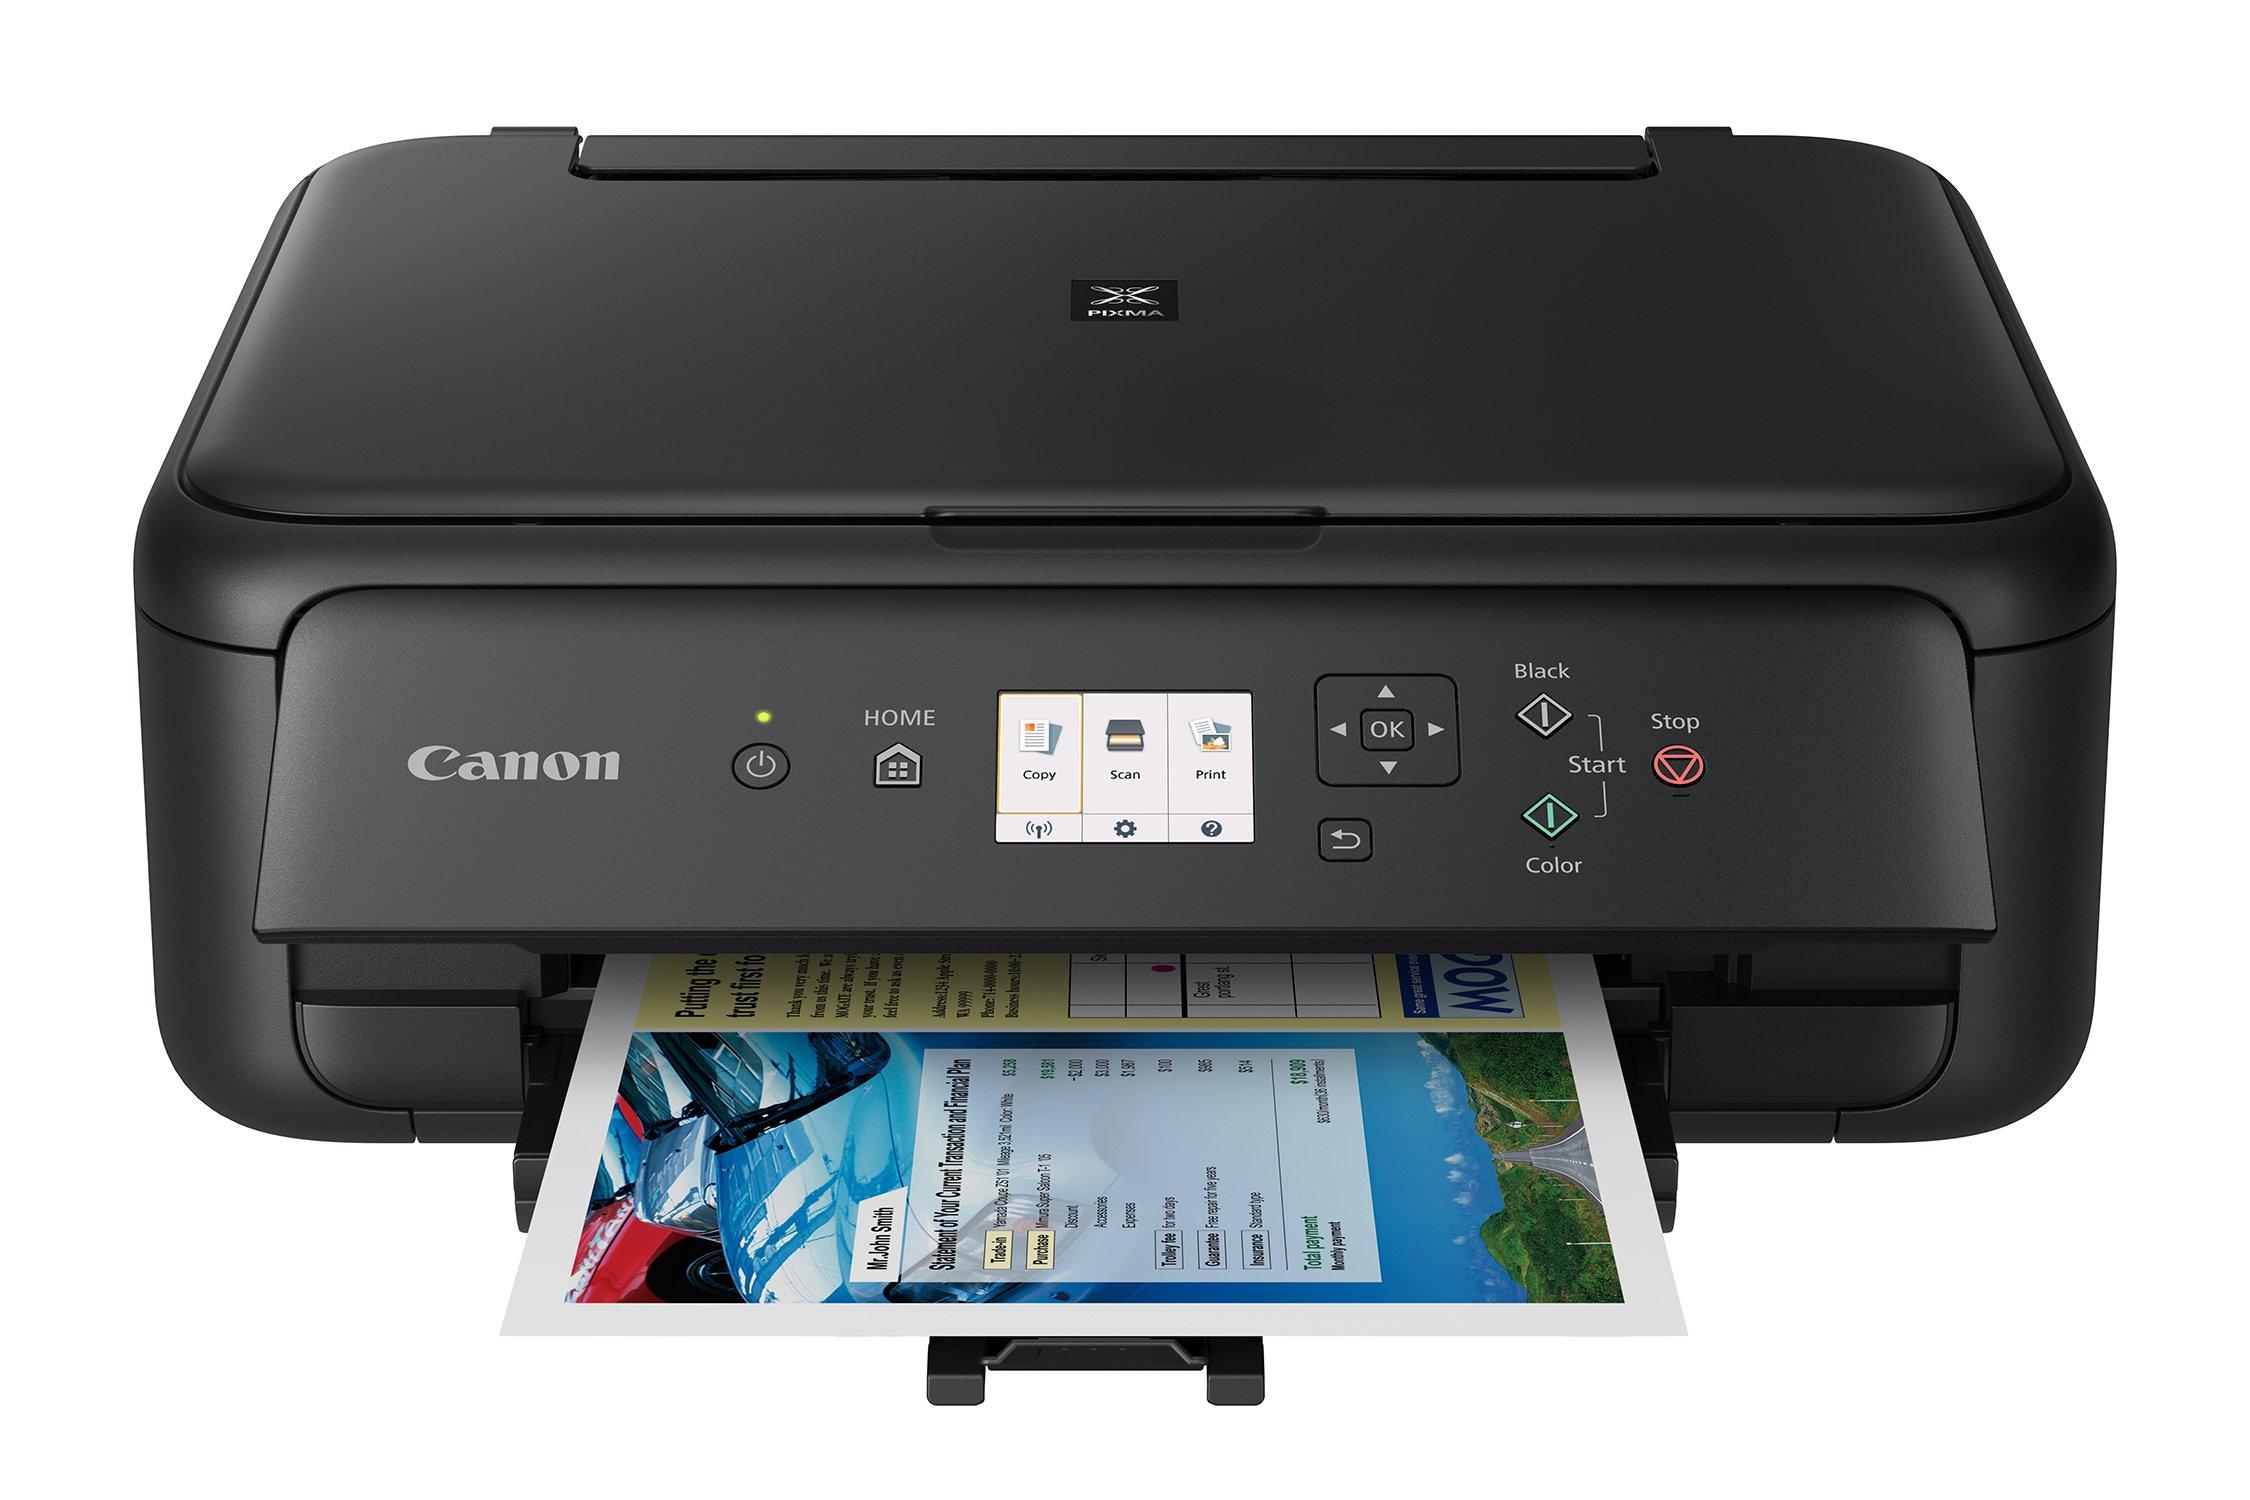 Canon TS5120 Wireless Printer Scanner